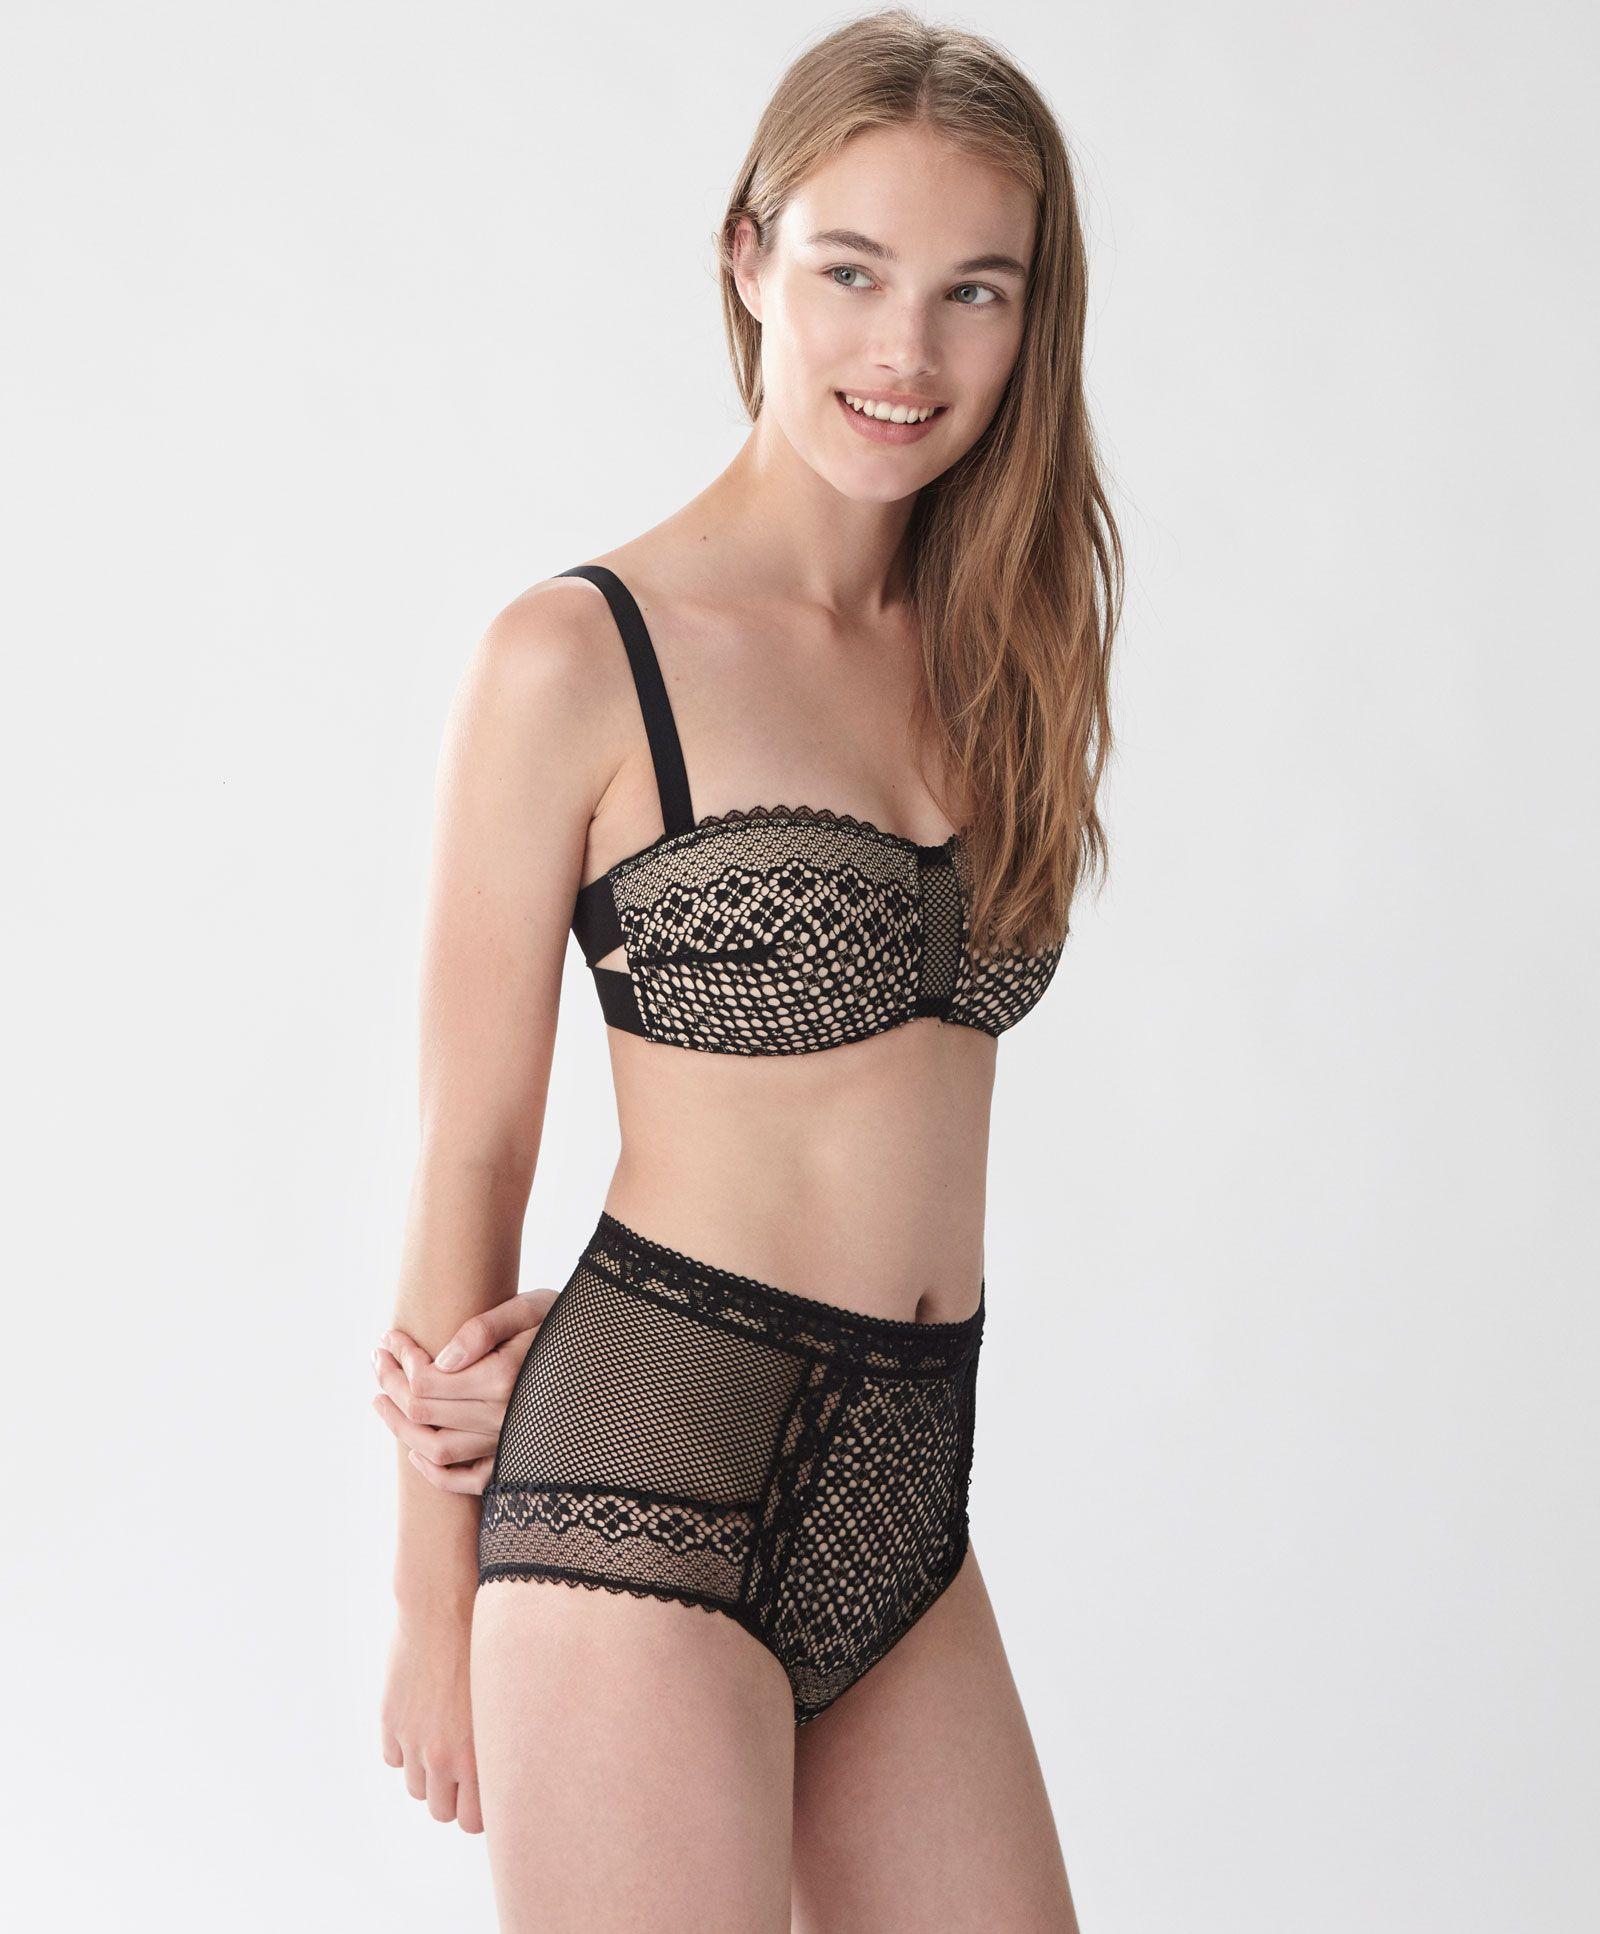 4a5a99956fe Sujetador bandeau encaje flor - Ver Todo - Tendencias AW 2016 en moda de  mujer en Oysho online  ropa interior